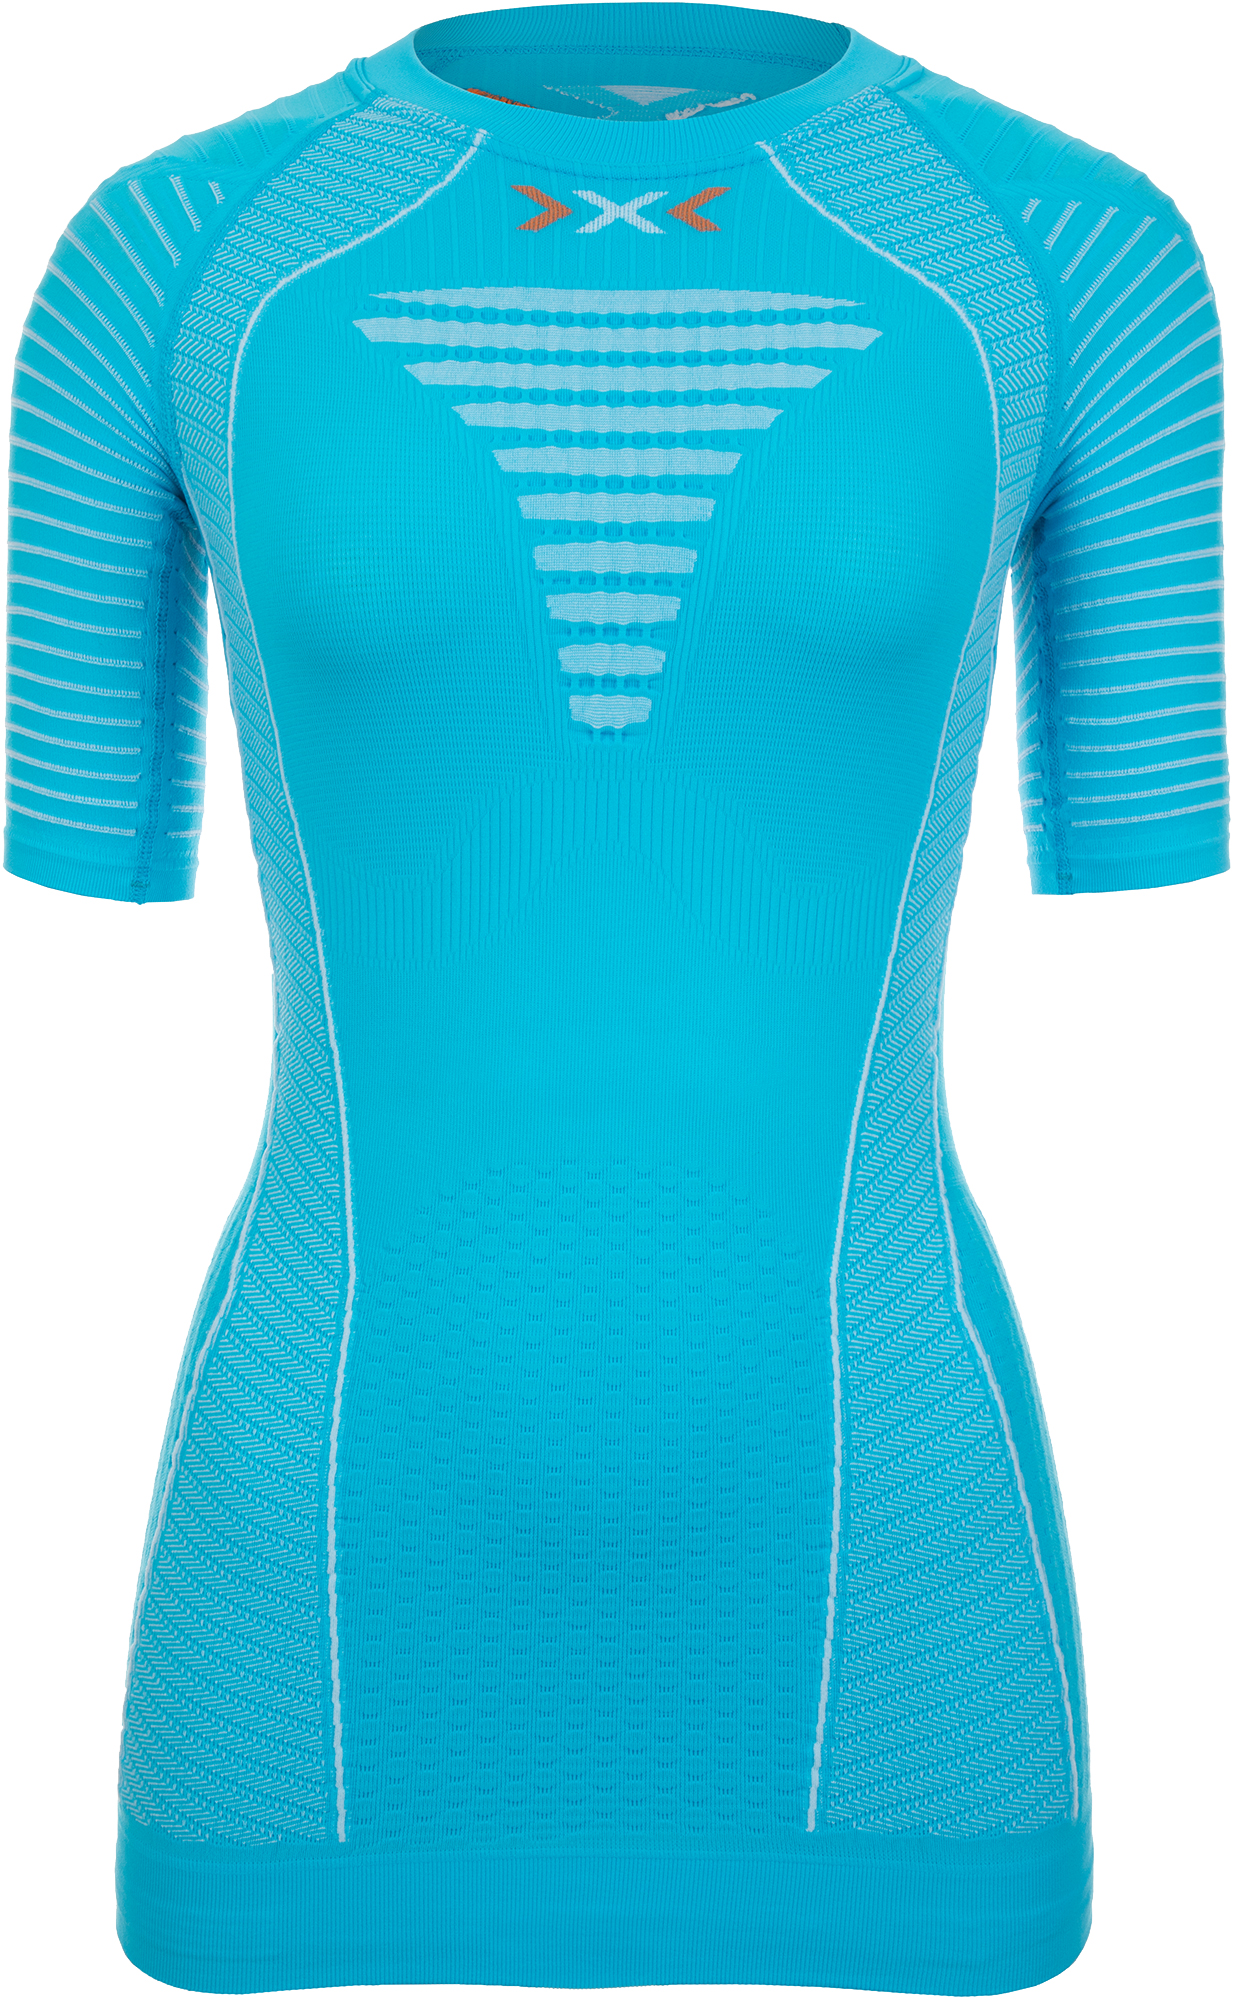 X-Bionic Футболка женская X-Bionic Effector Power Ow, размер 48 футболка x bionic x bionic effektor running powershirt®